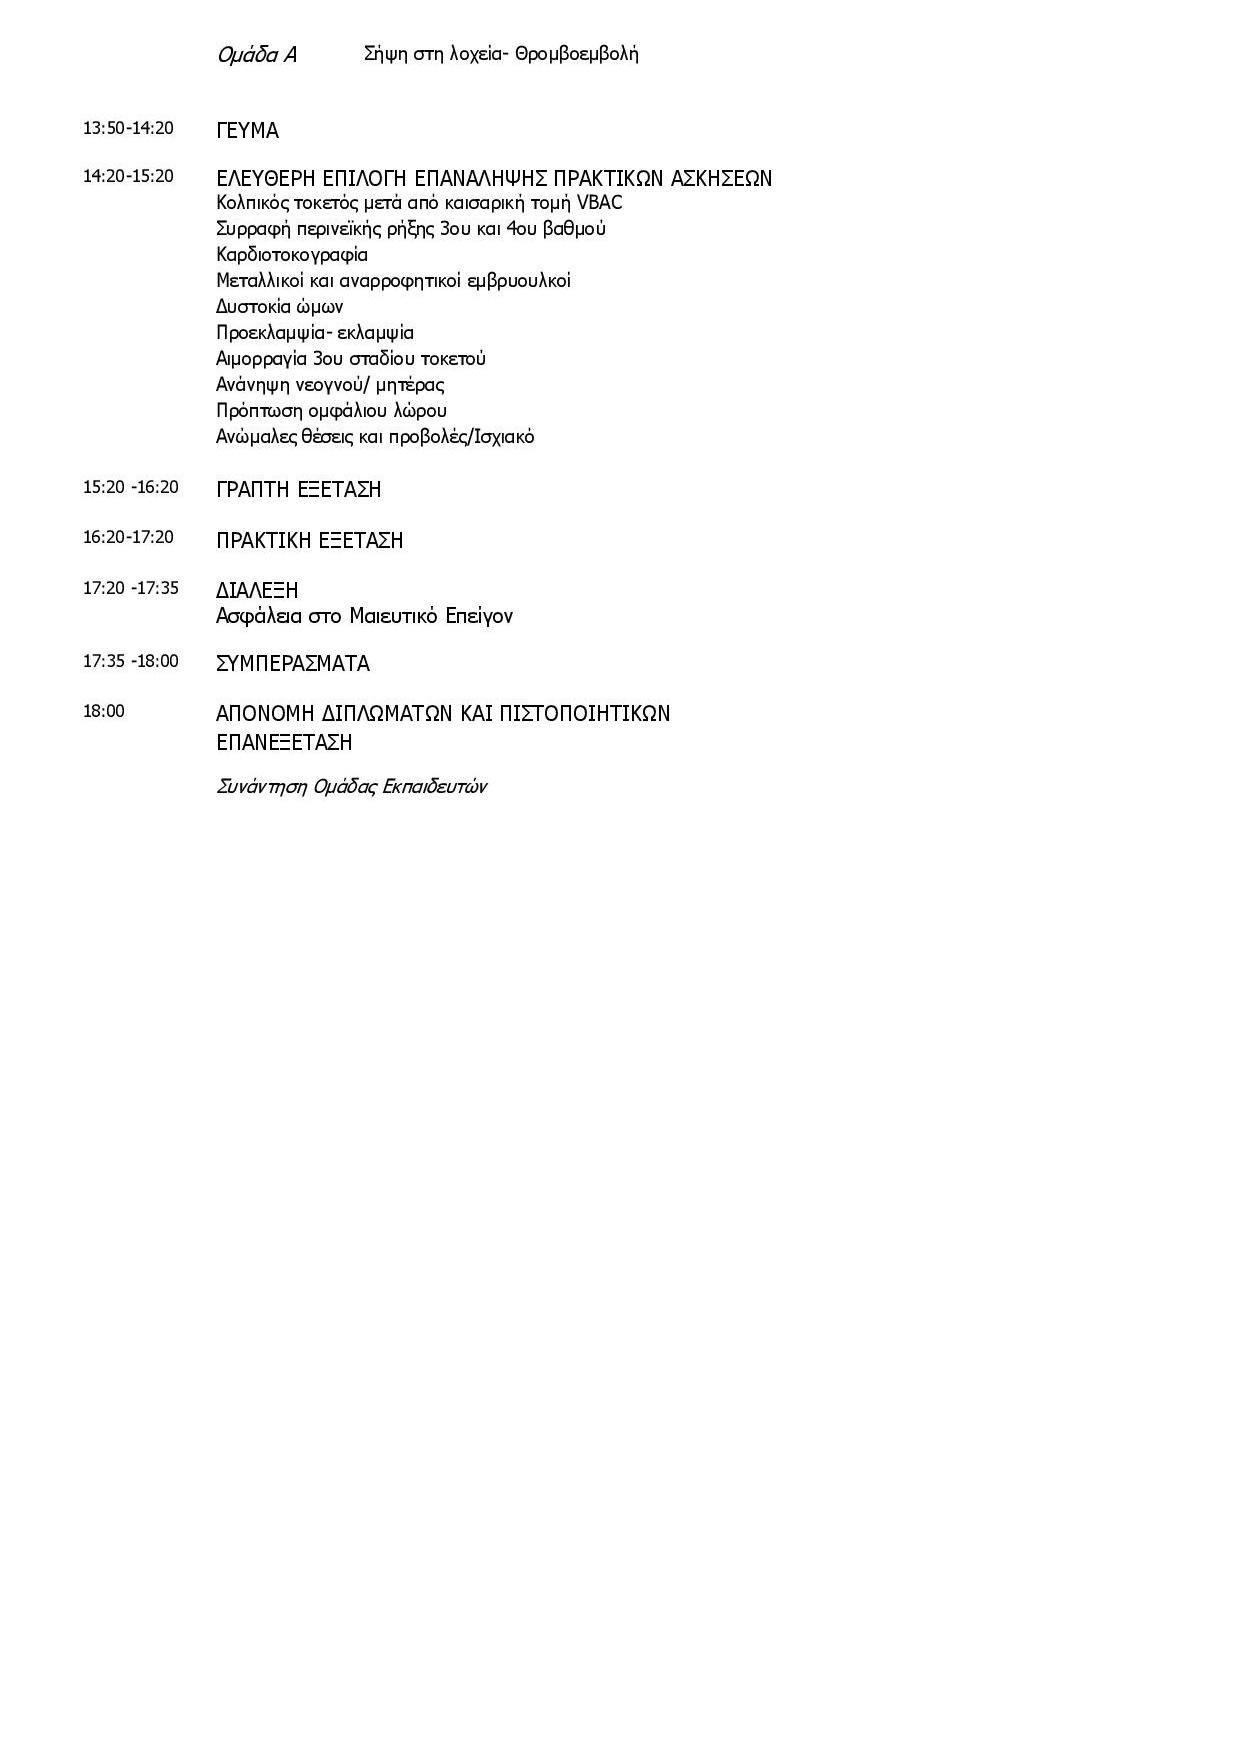 NATIONAL CONGRESS PROGRAM-page-004